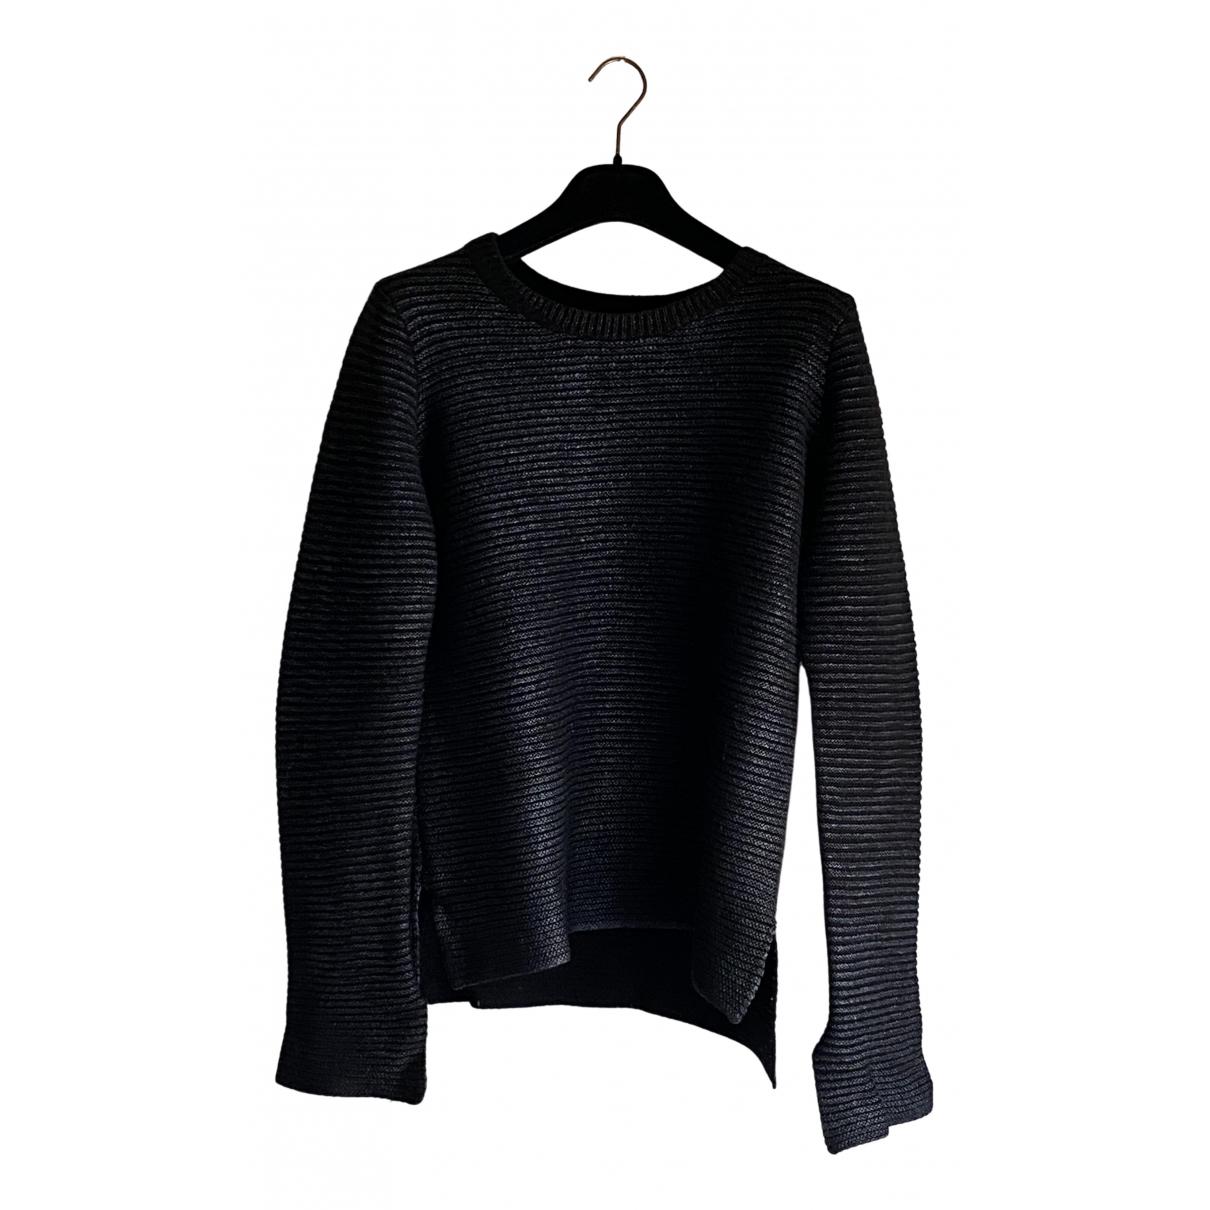 Zadig & Voltaire \N Metallic Wool Knitwear for Women M International